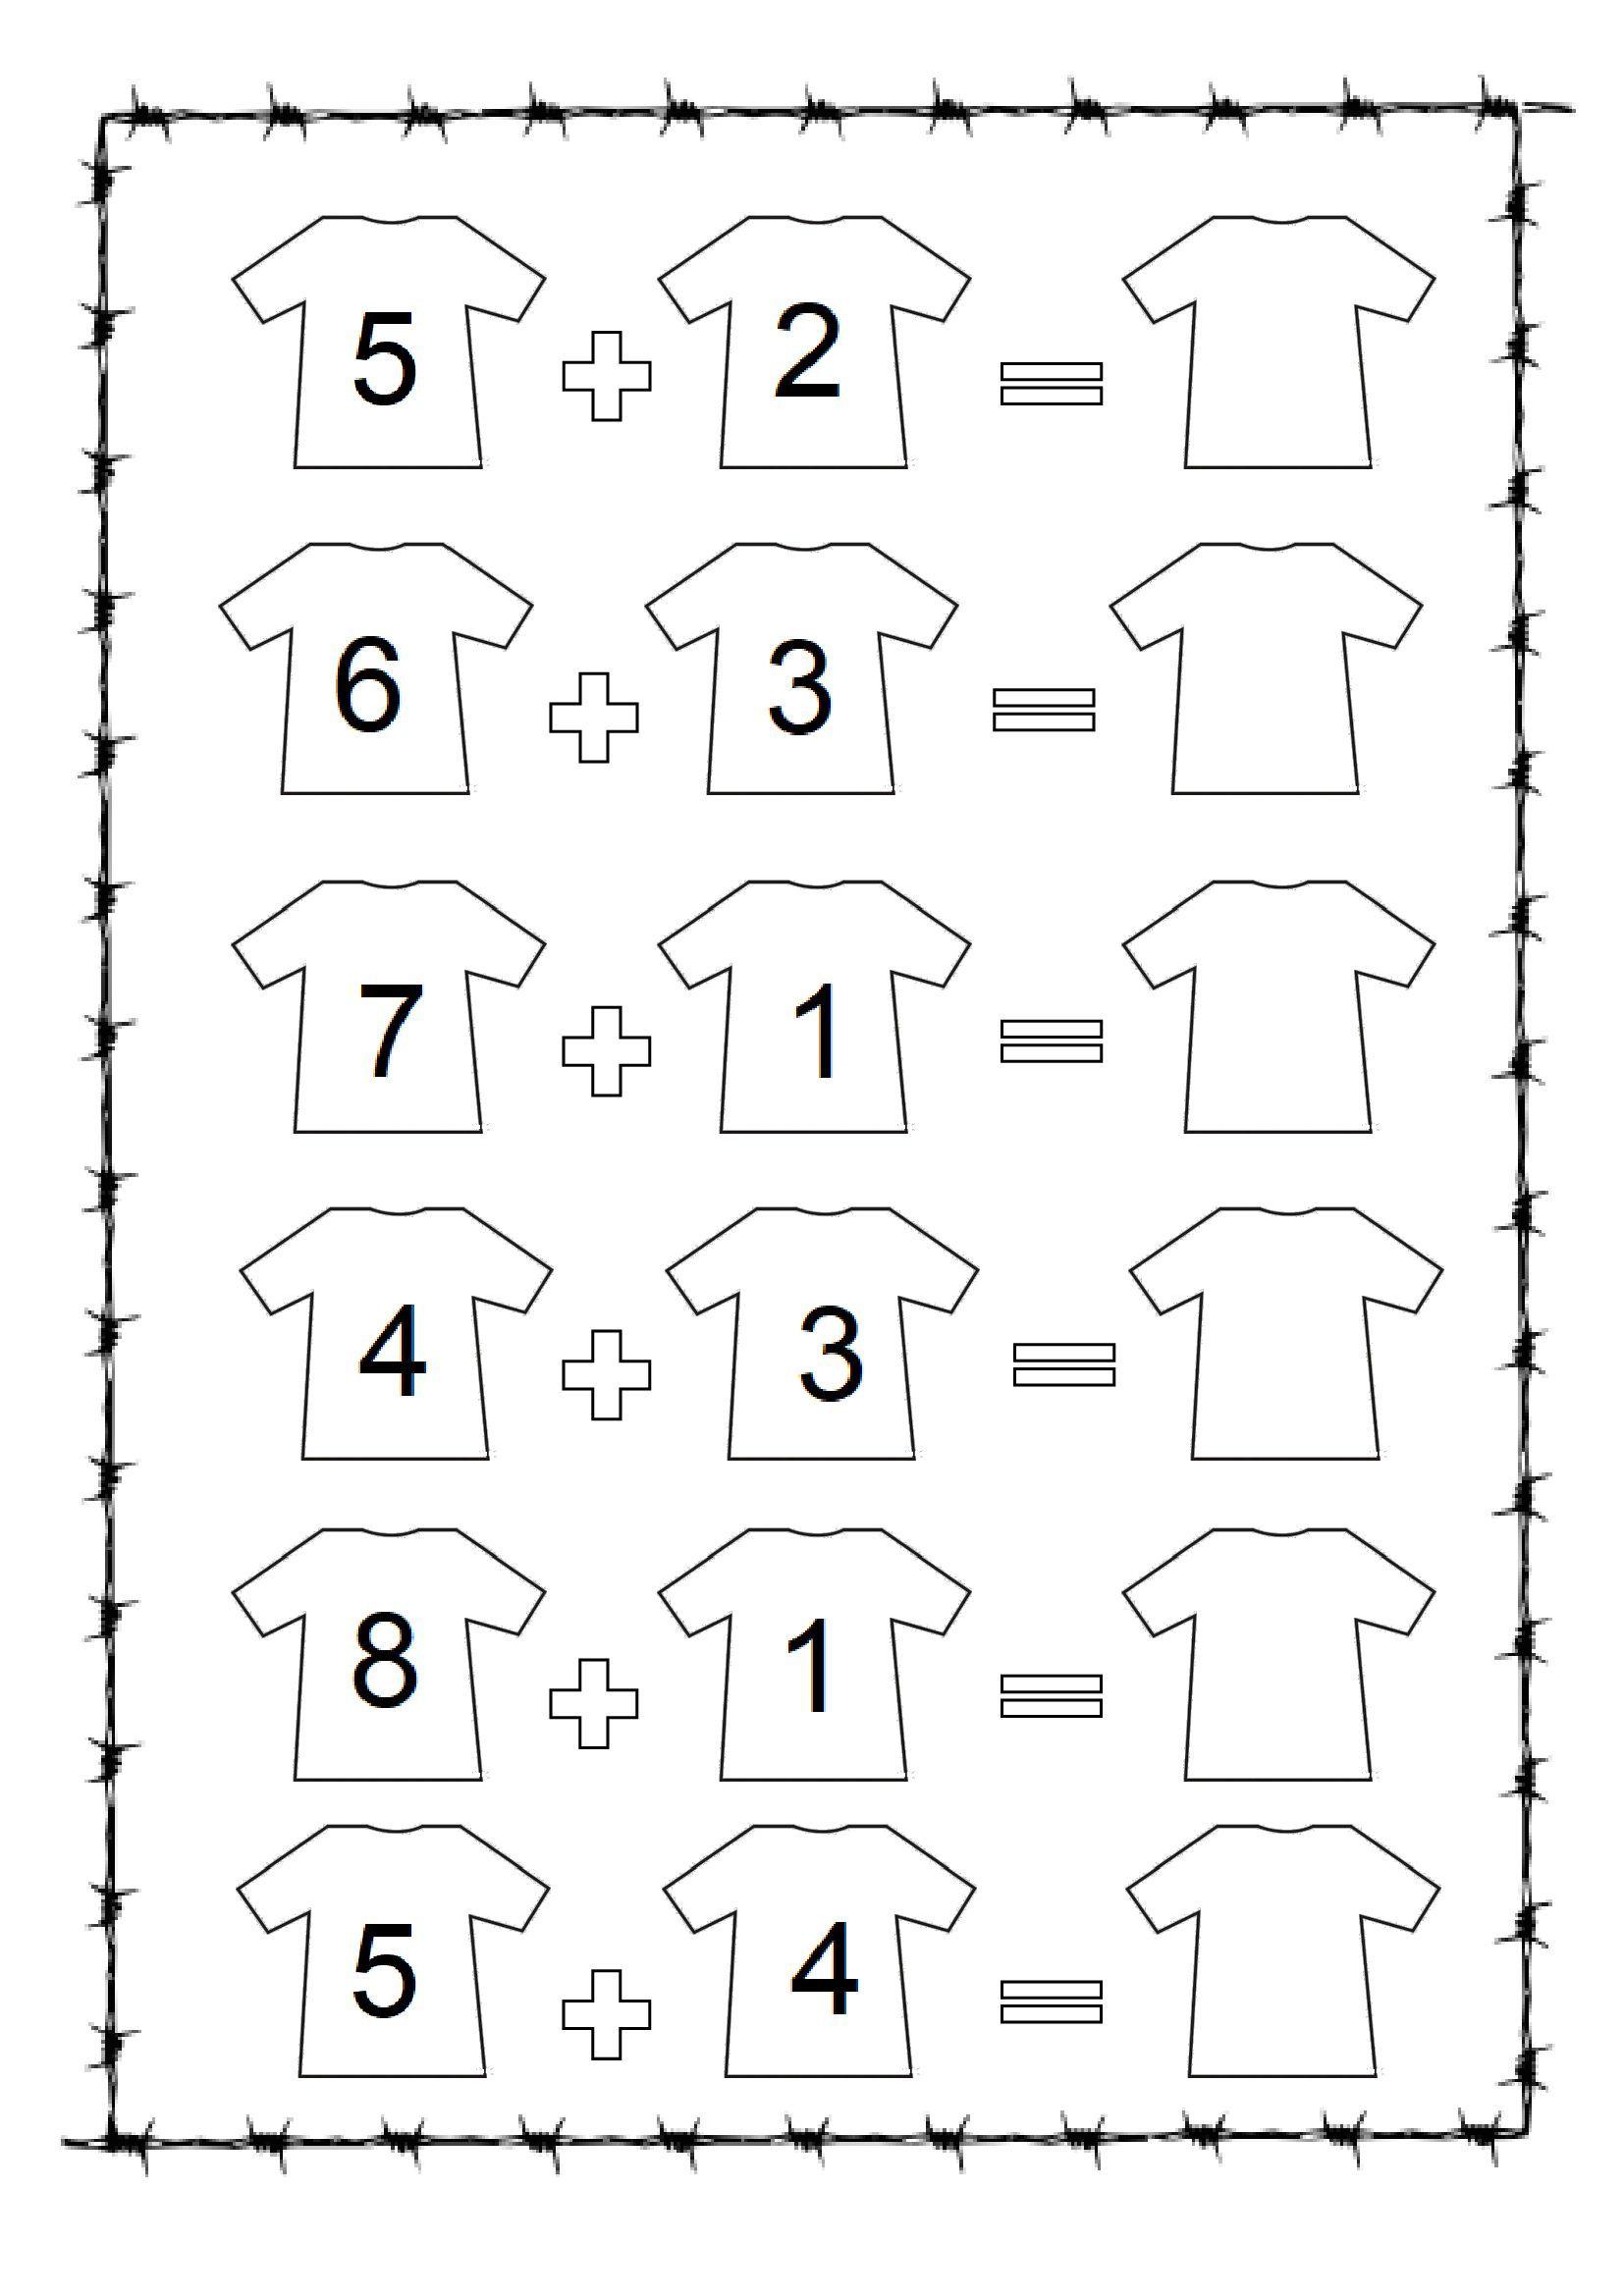 Adding worksheet for kindergarten